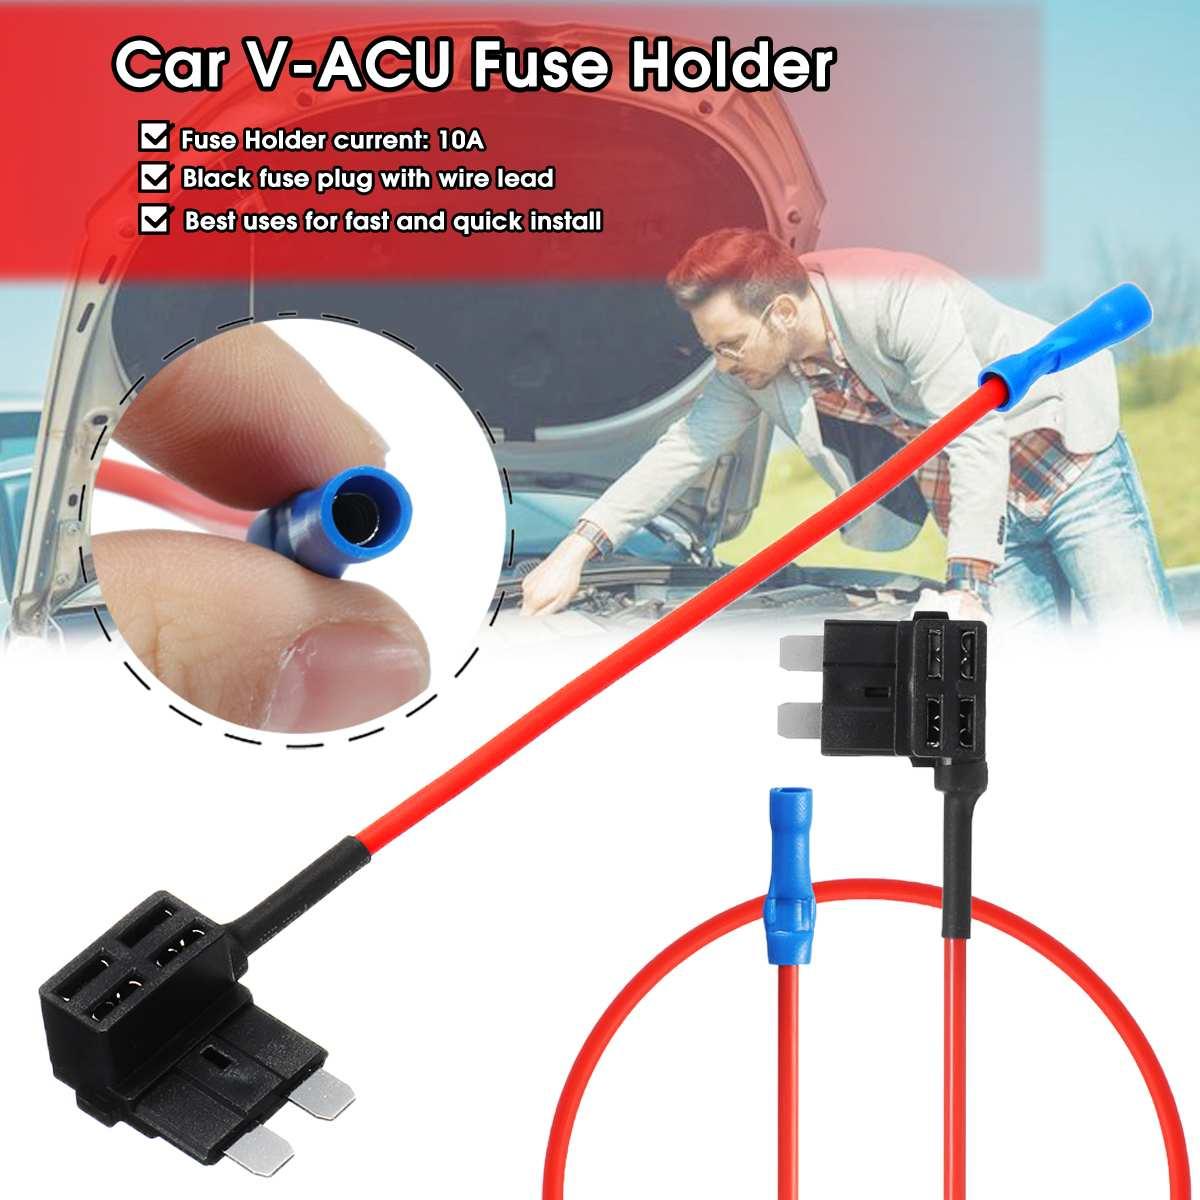 V Acu Fuse Holder Car Add Circuit Piggy Back Tap Standard Ato Atc Blade Fuse Boxe Holder Set